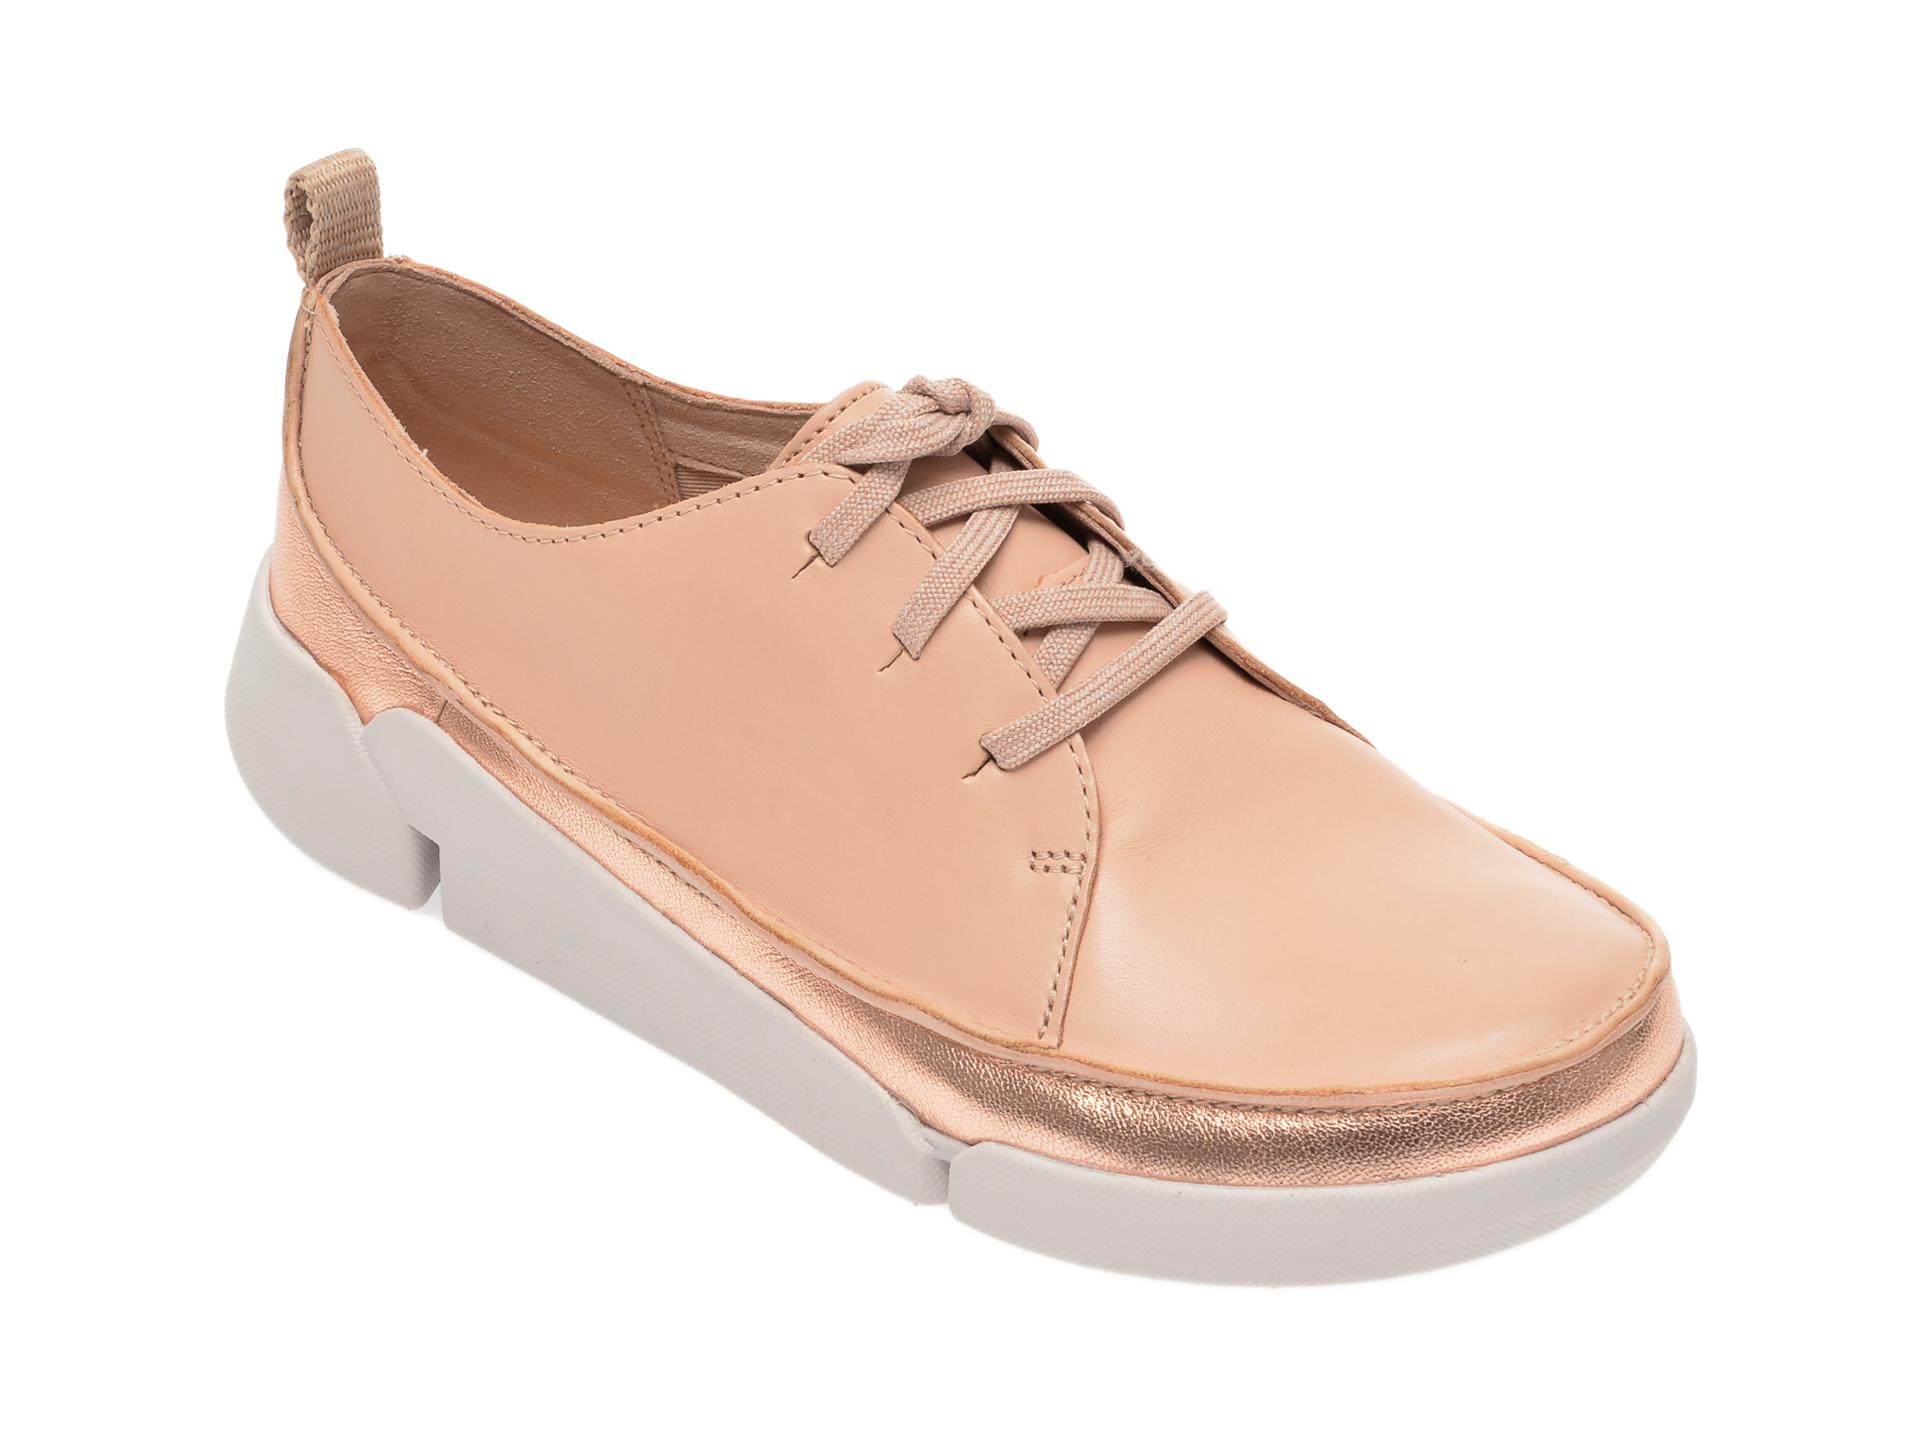 Pantofi CLARKS nude, Tri Clara, din piele naturala